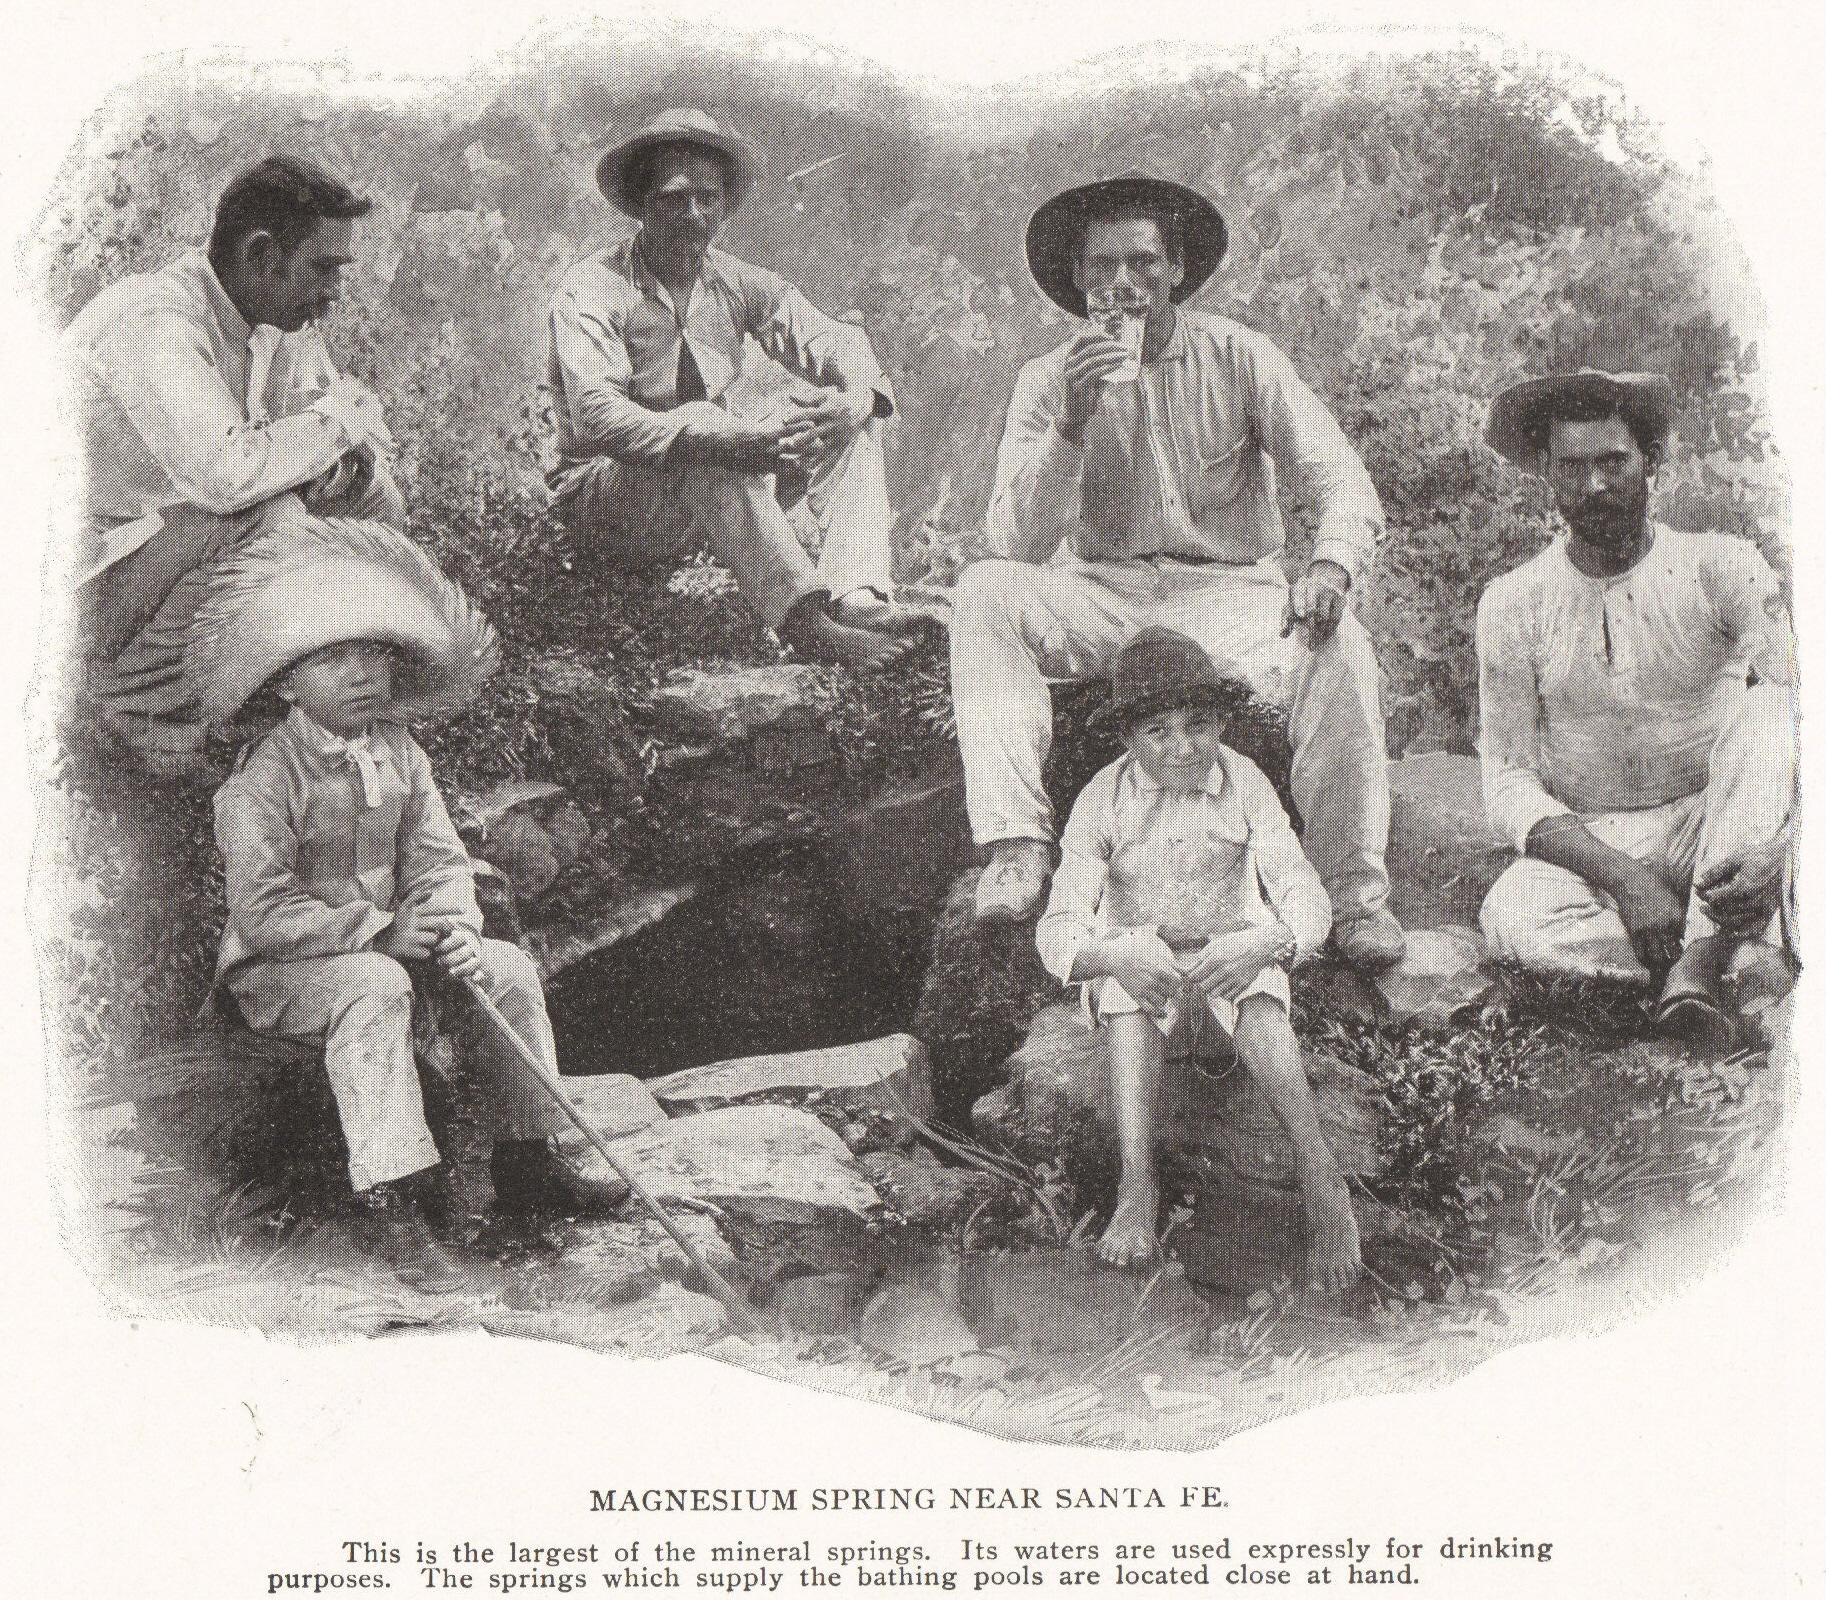 Magnesium Spring near Santa Fe, Cuba (1898)